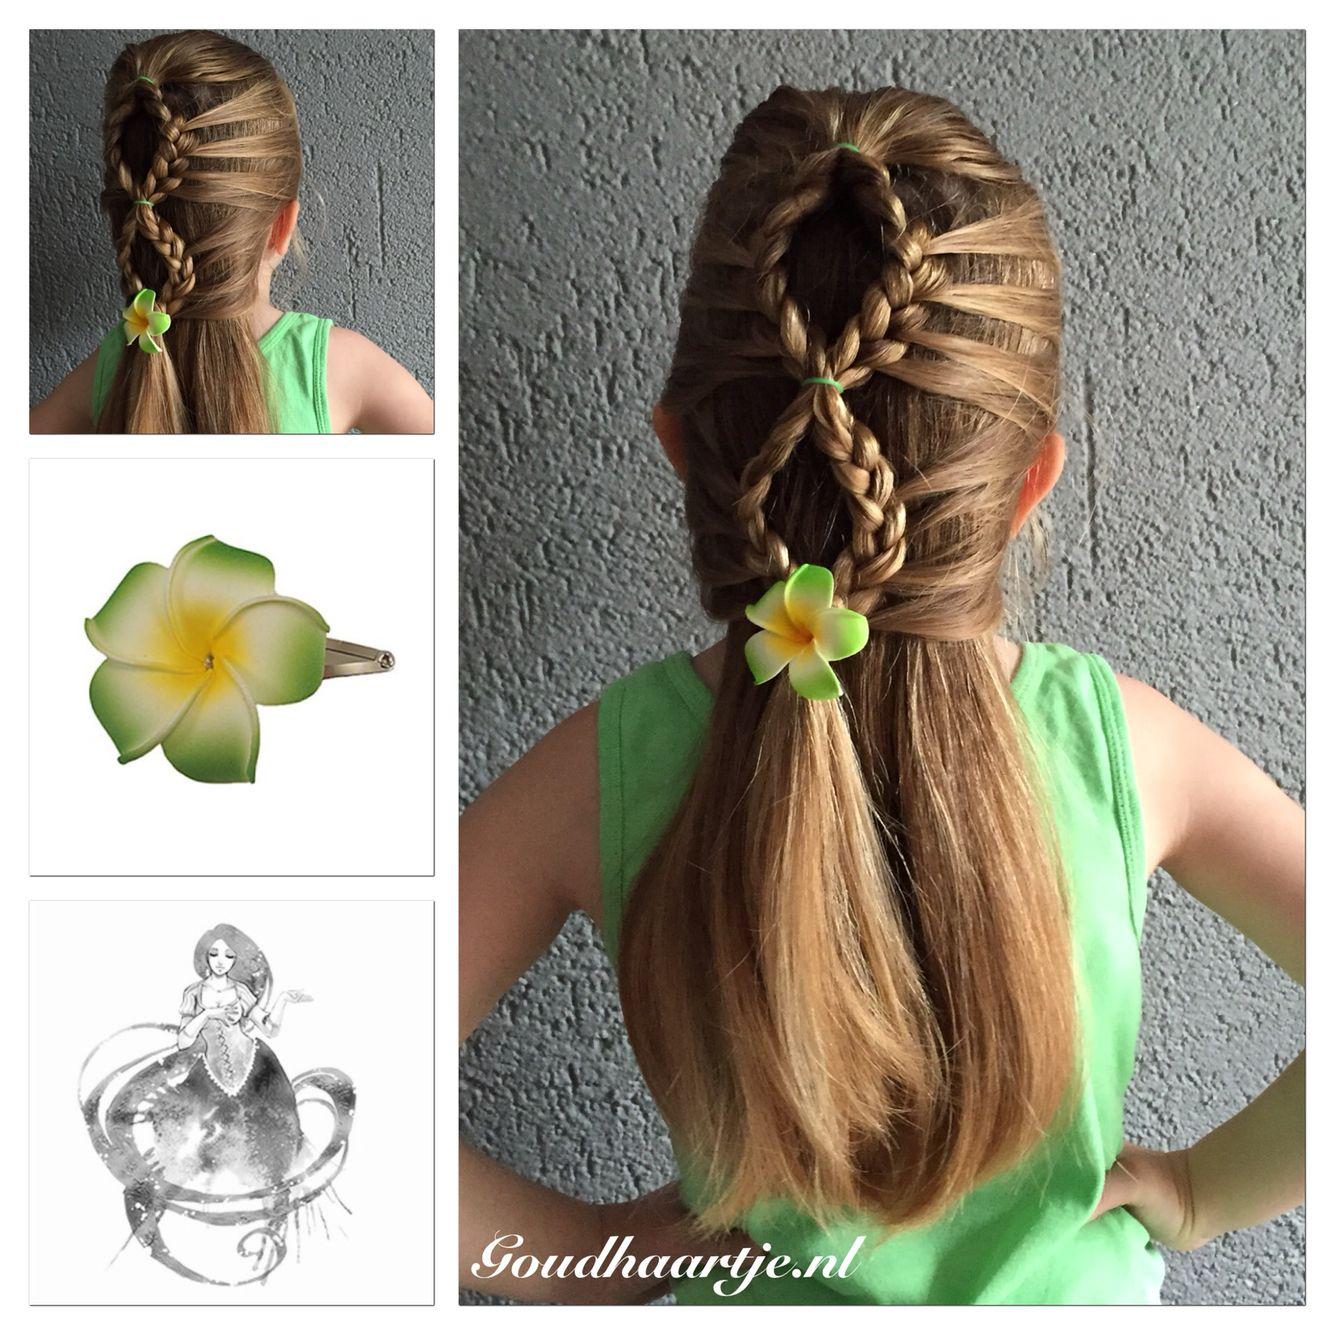 Mermaid braid with beautiful hair flower from goudhaartje mermaid braid with beautiful hair flower from goudhaartje mermaidbraid hairflower braid izmirmasajfo